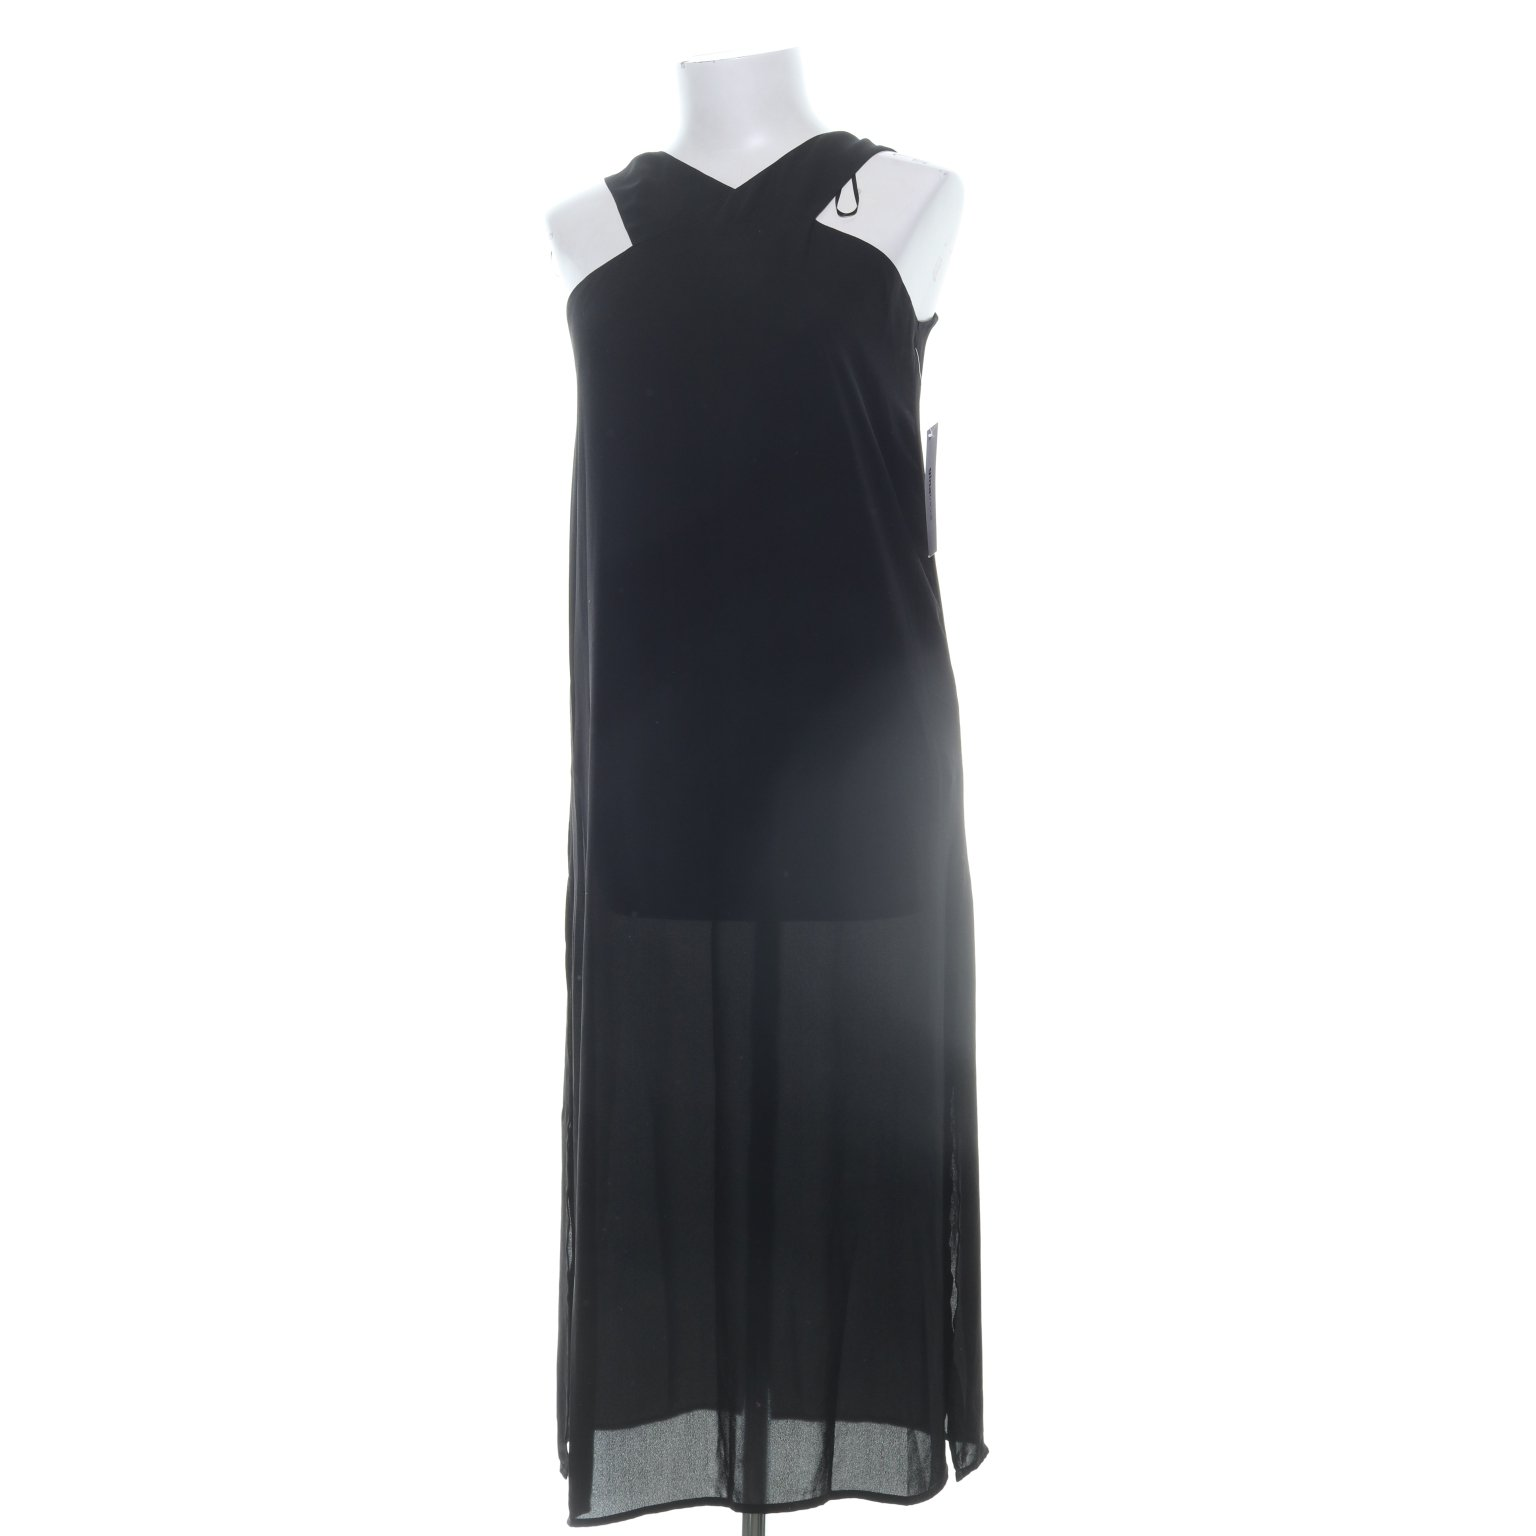 Gina Tricot, Långklänning, Strl: XS, Elli.. (364936992) ᐈ